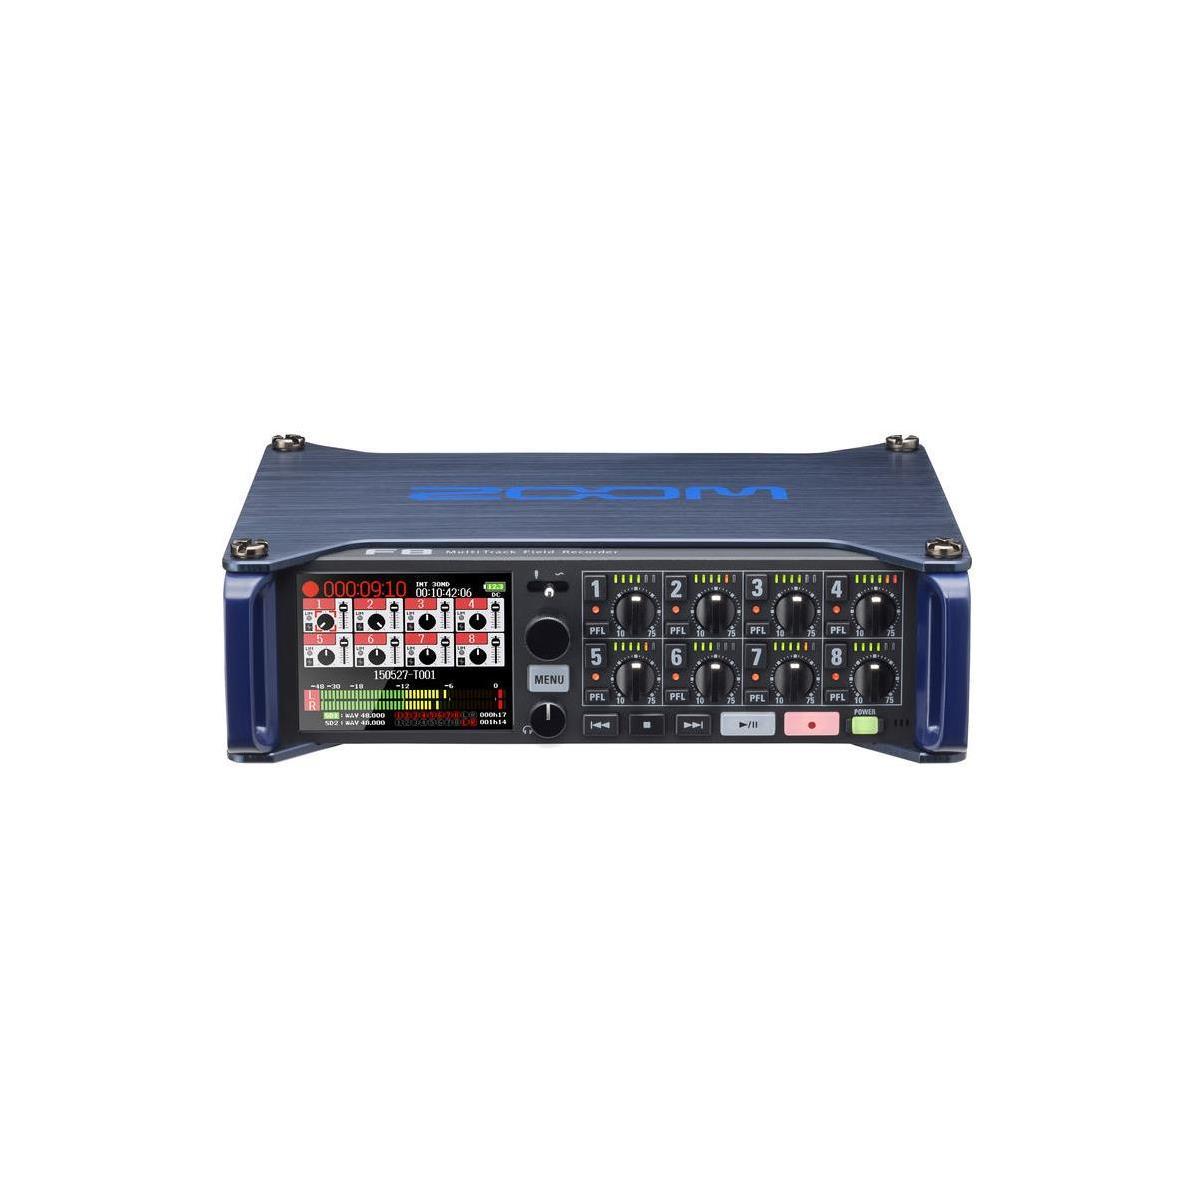 Zoom F8 Multi Track Field Recorder (XLR) $629 + free s/h